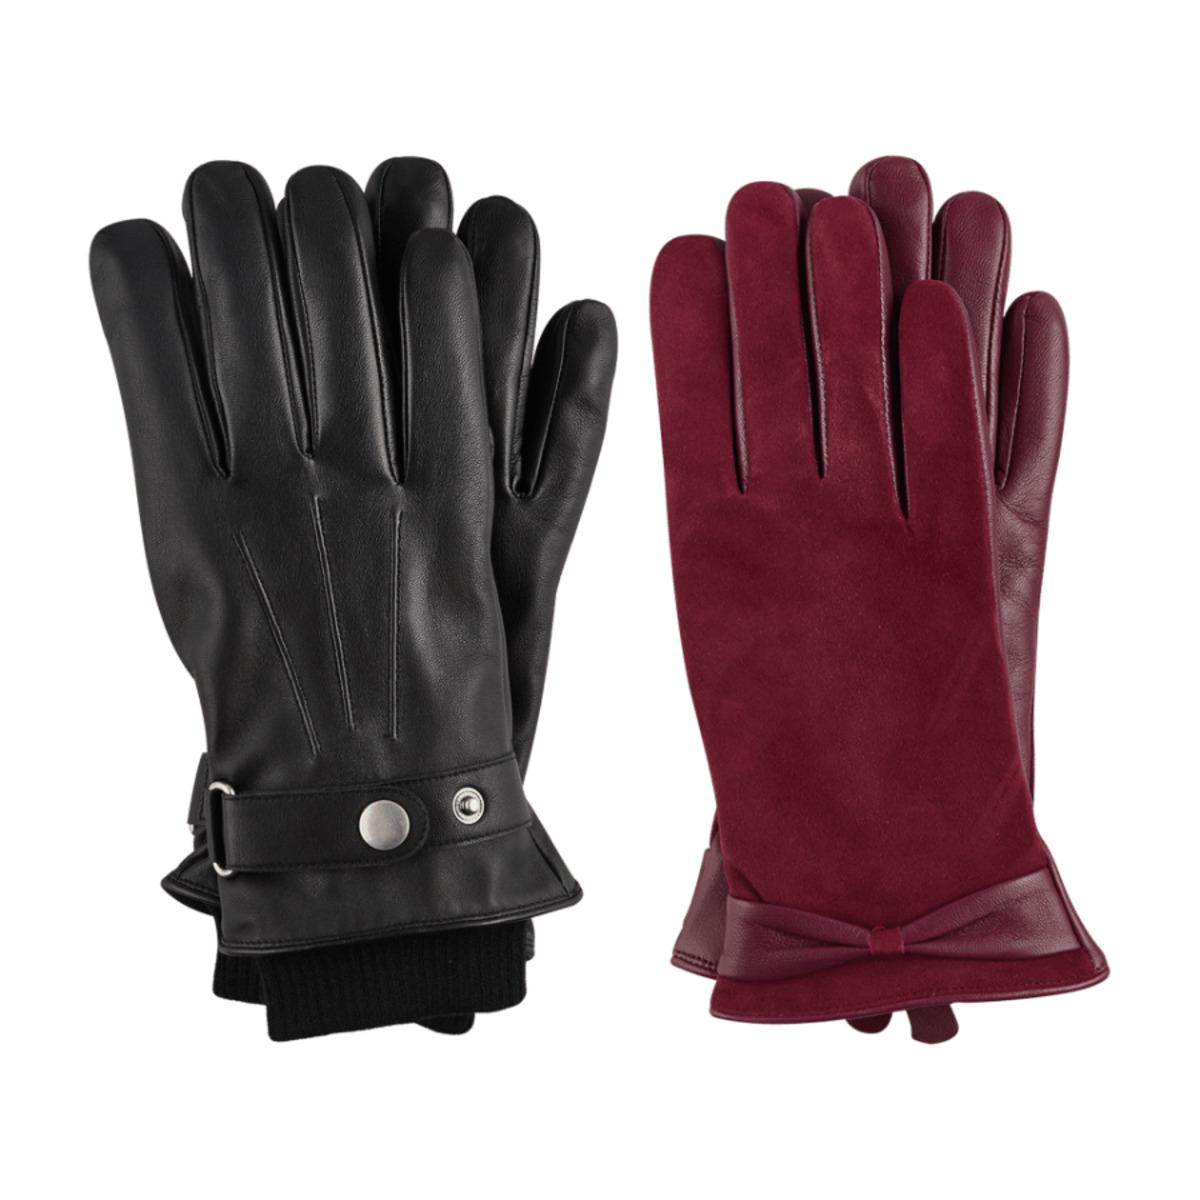 Bild 1 von ROYAL LIFE     Leder-Handschuhe